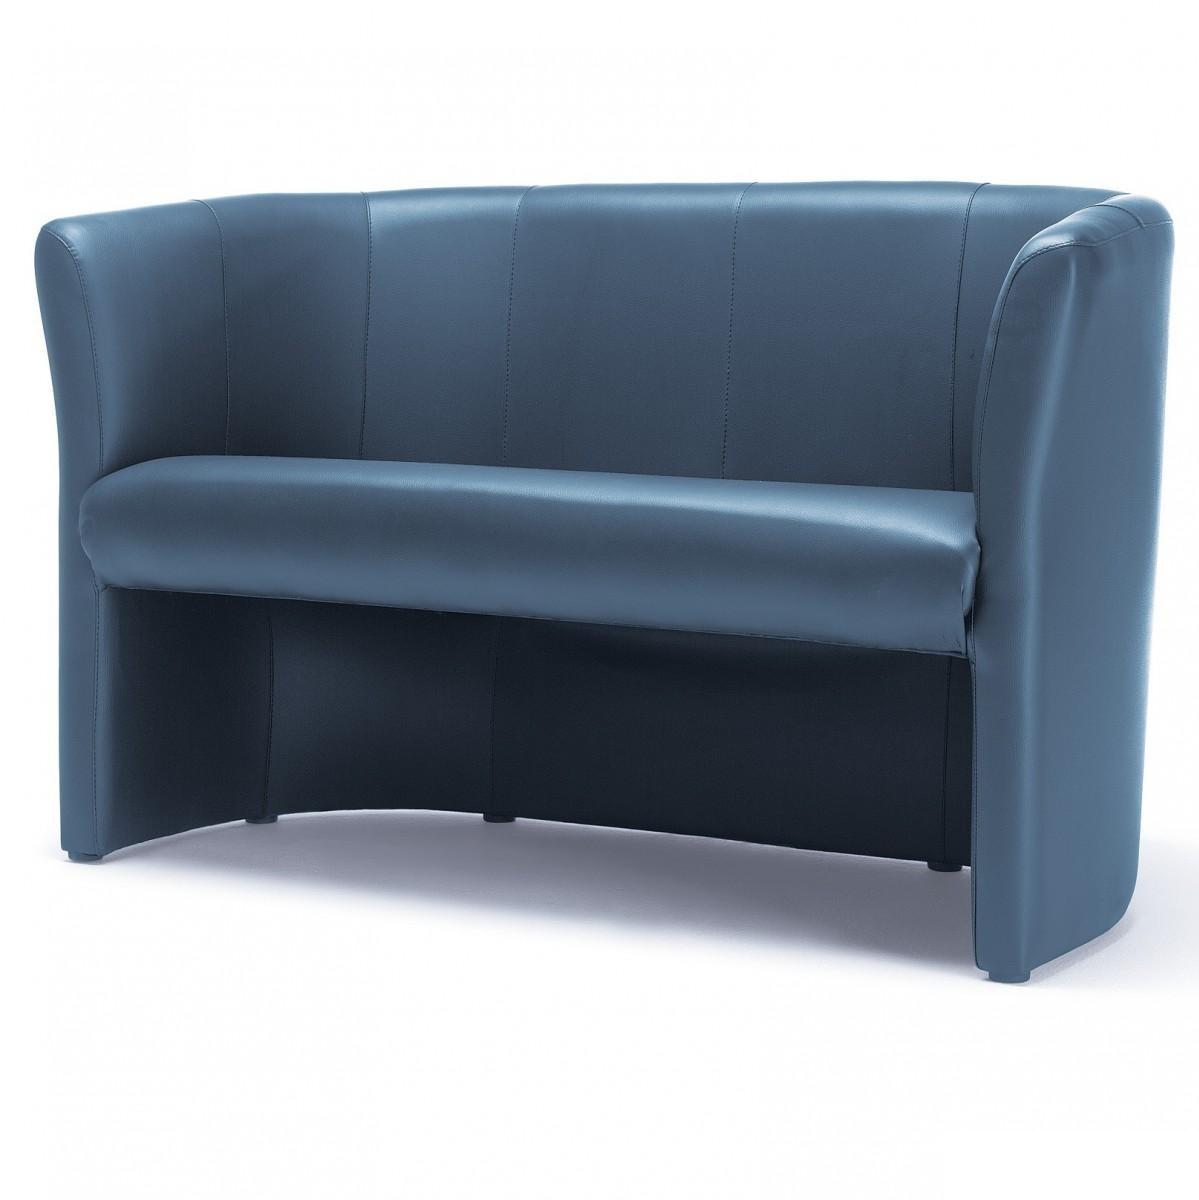 Sofa Vancouver Round Mjob Blog